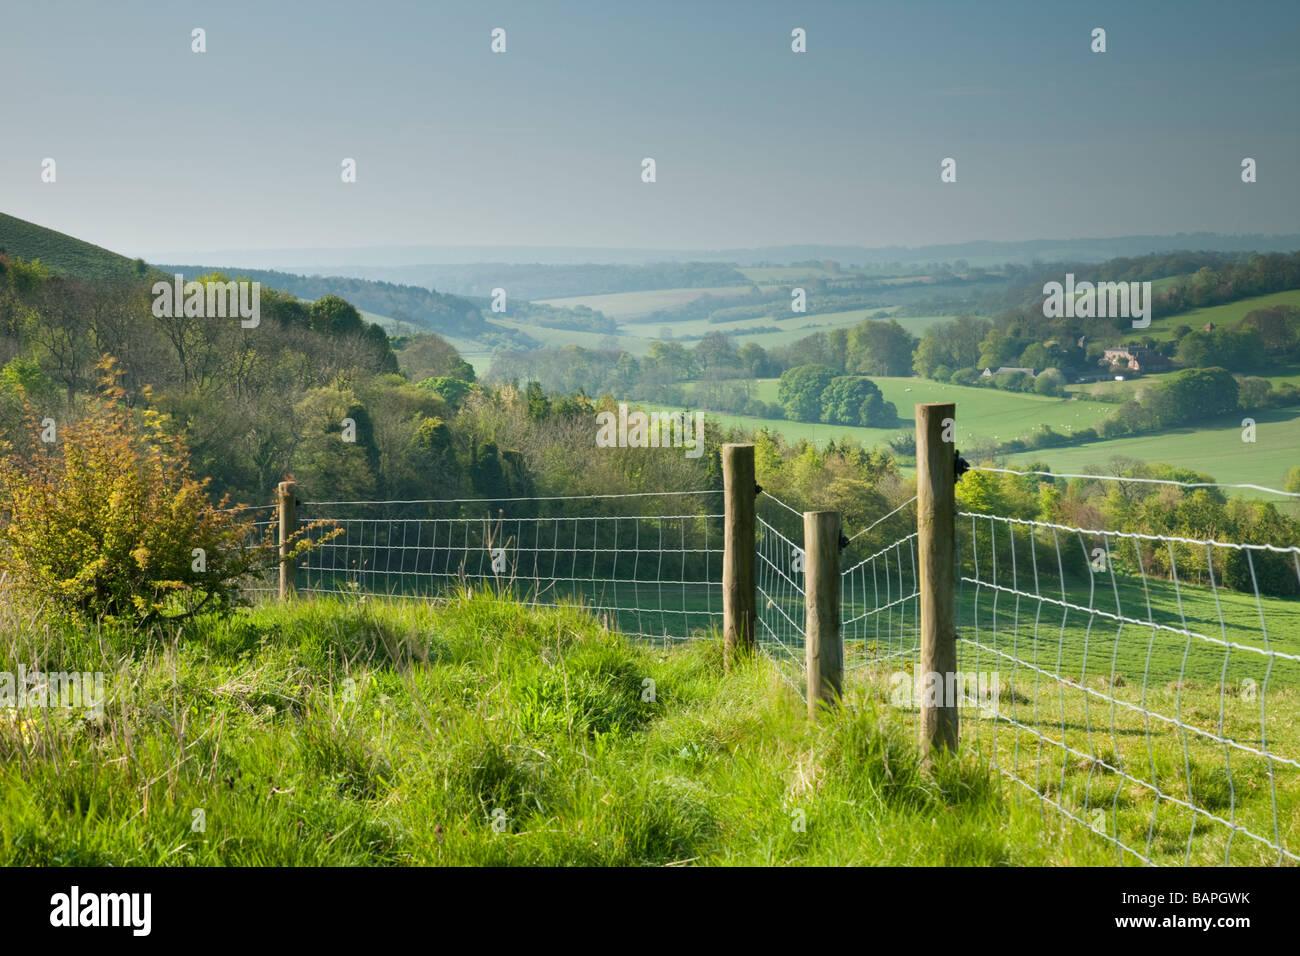 Walbury Stock Photos & Walbury Stock Images - Alamy